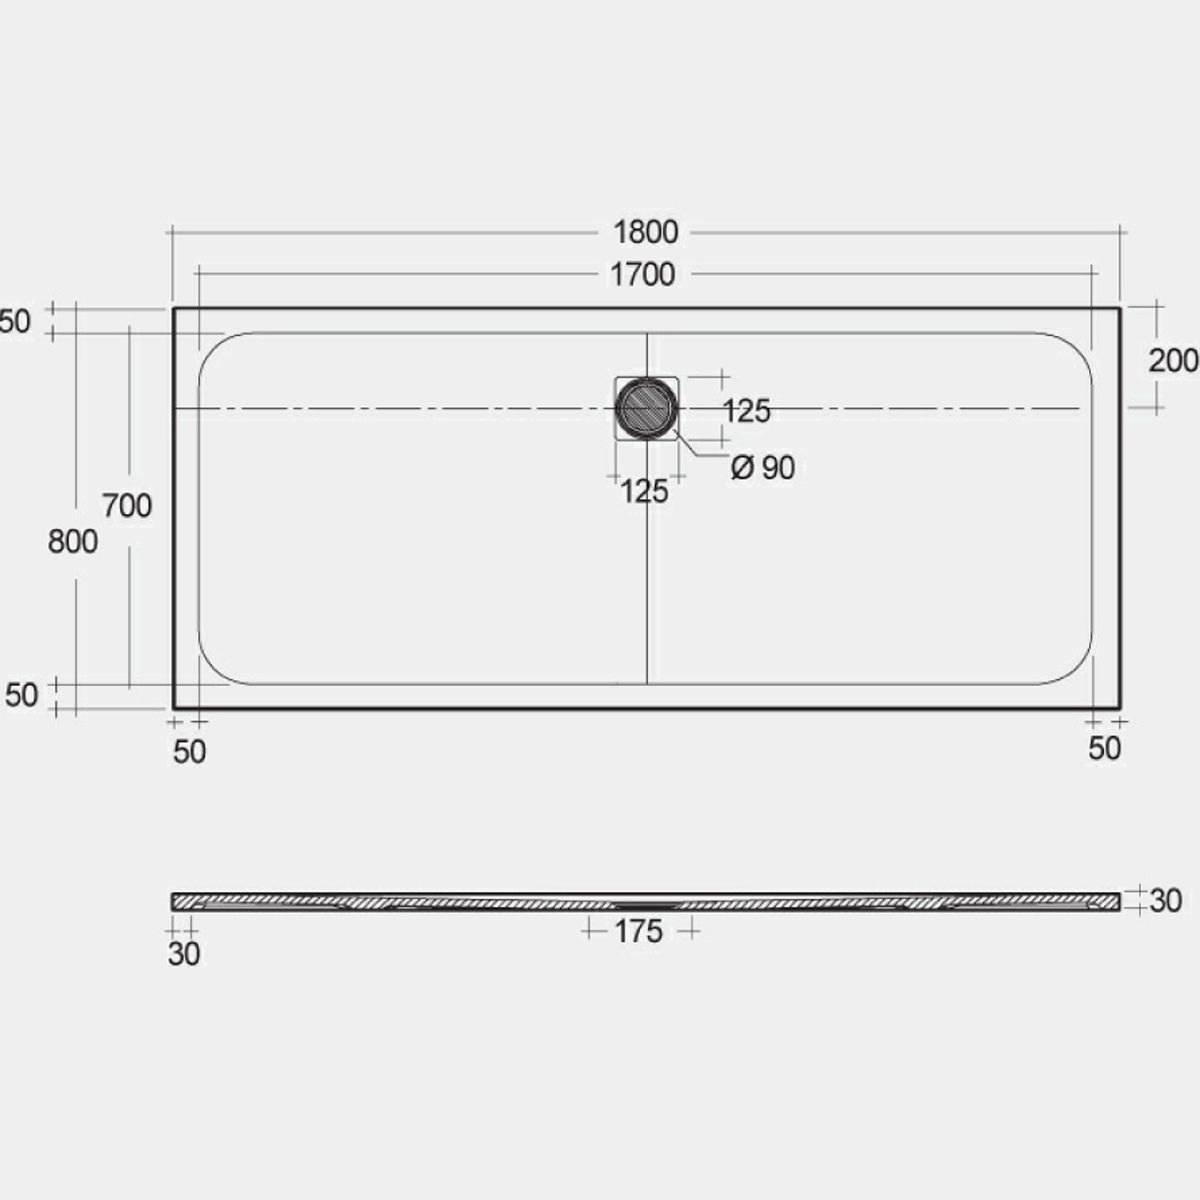 RAK Feeling Greige Rectangular Shower Tray 1800 x 800mm Measurements